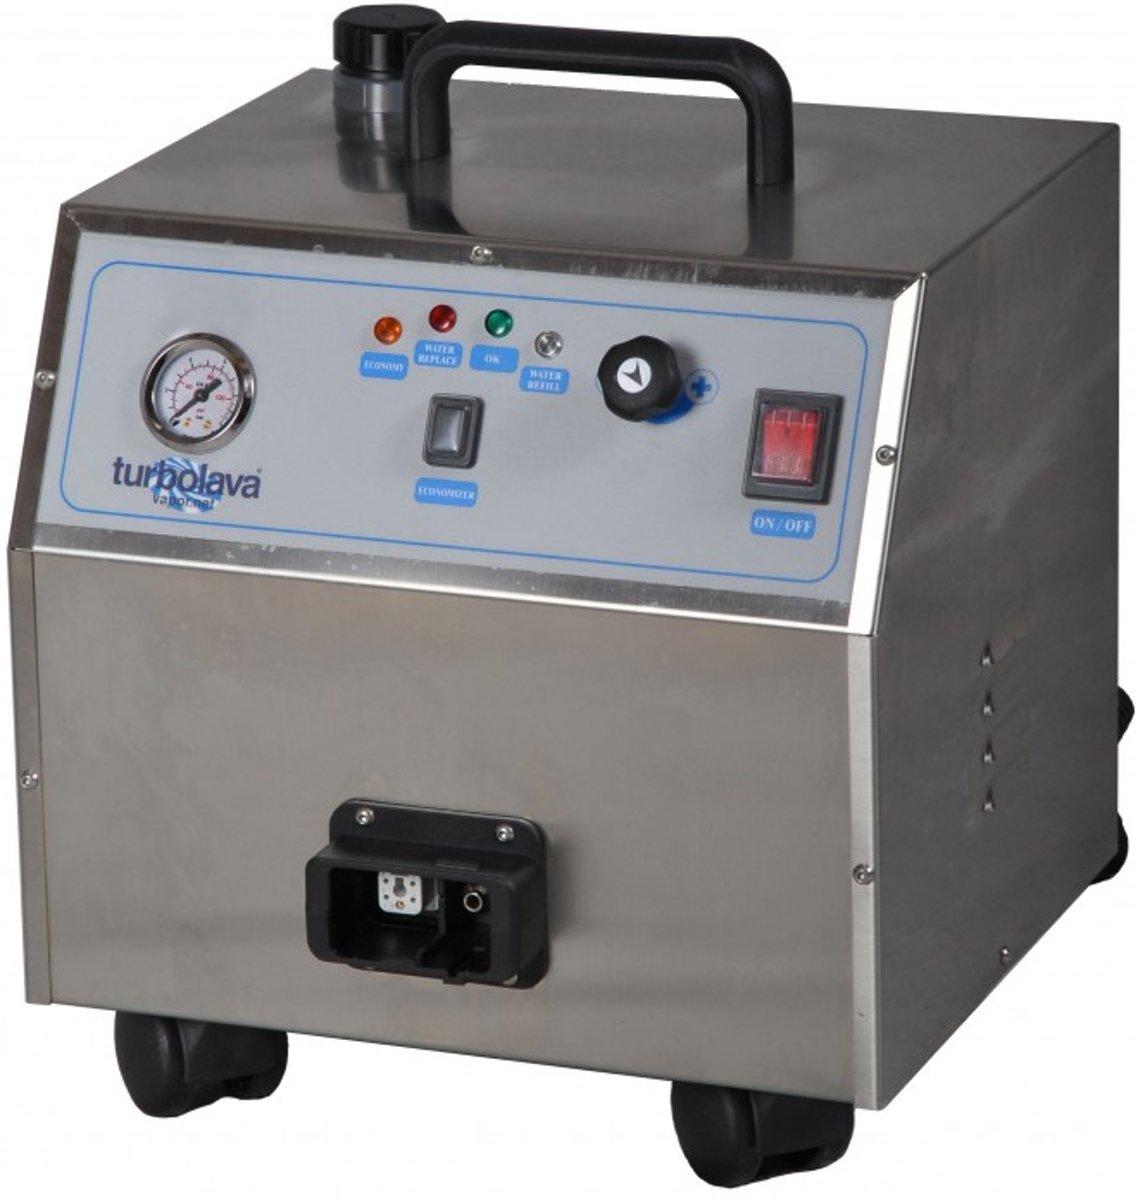 CIMEL Vapor.Net 2800W stoomreiniger met RVS ketel AISI 304 kopen